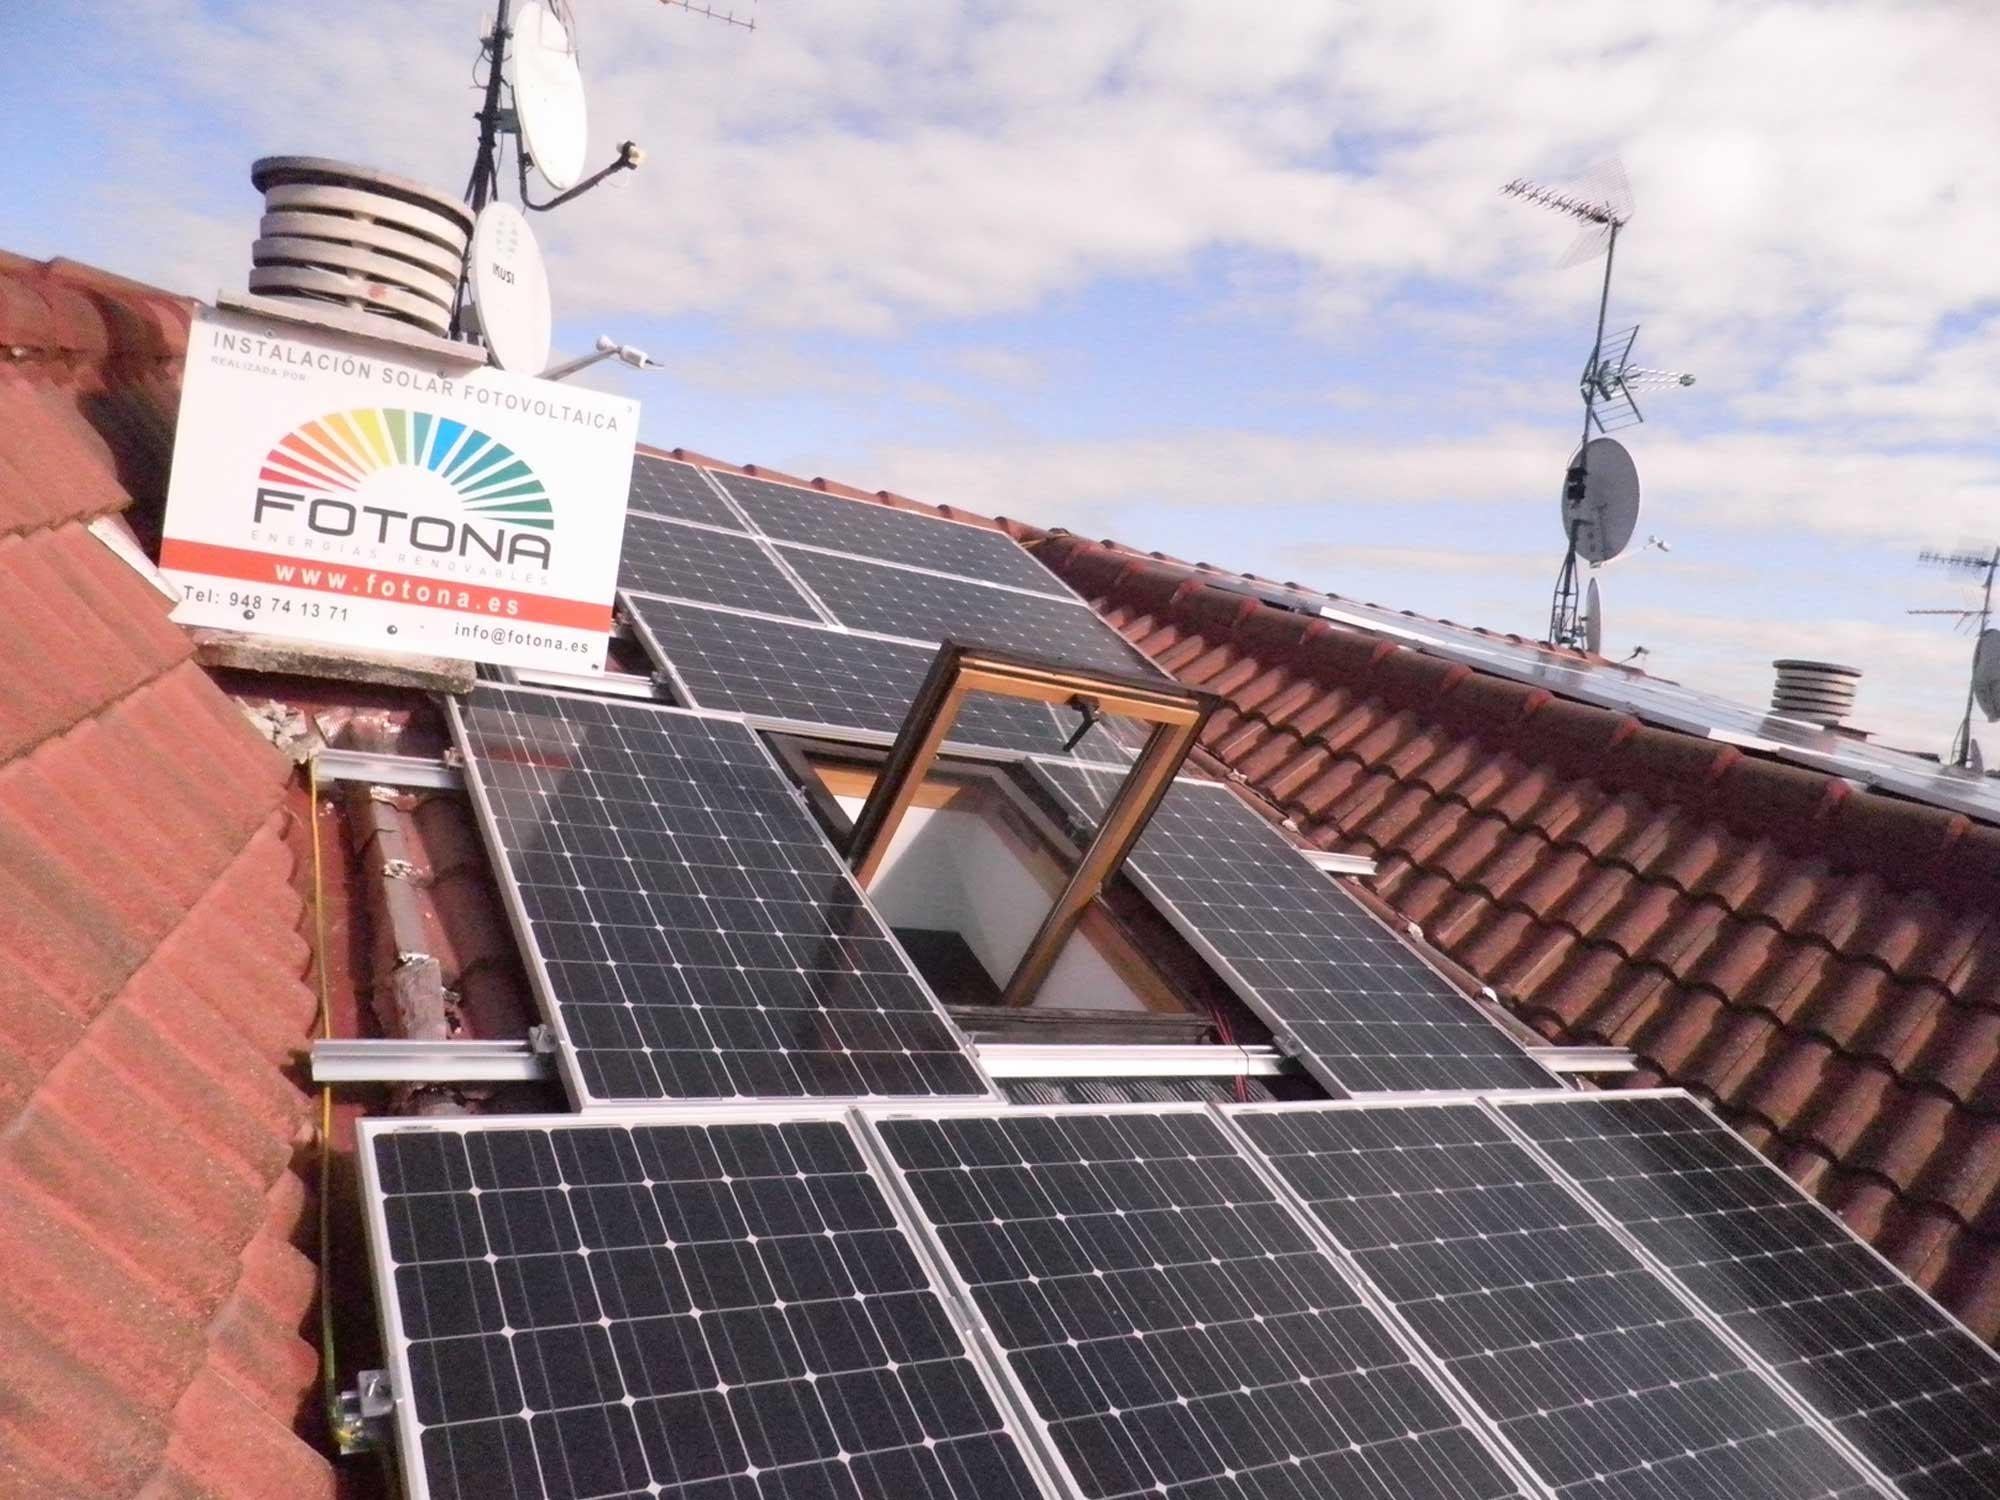 fotovoltaica medicion neta